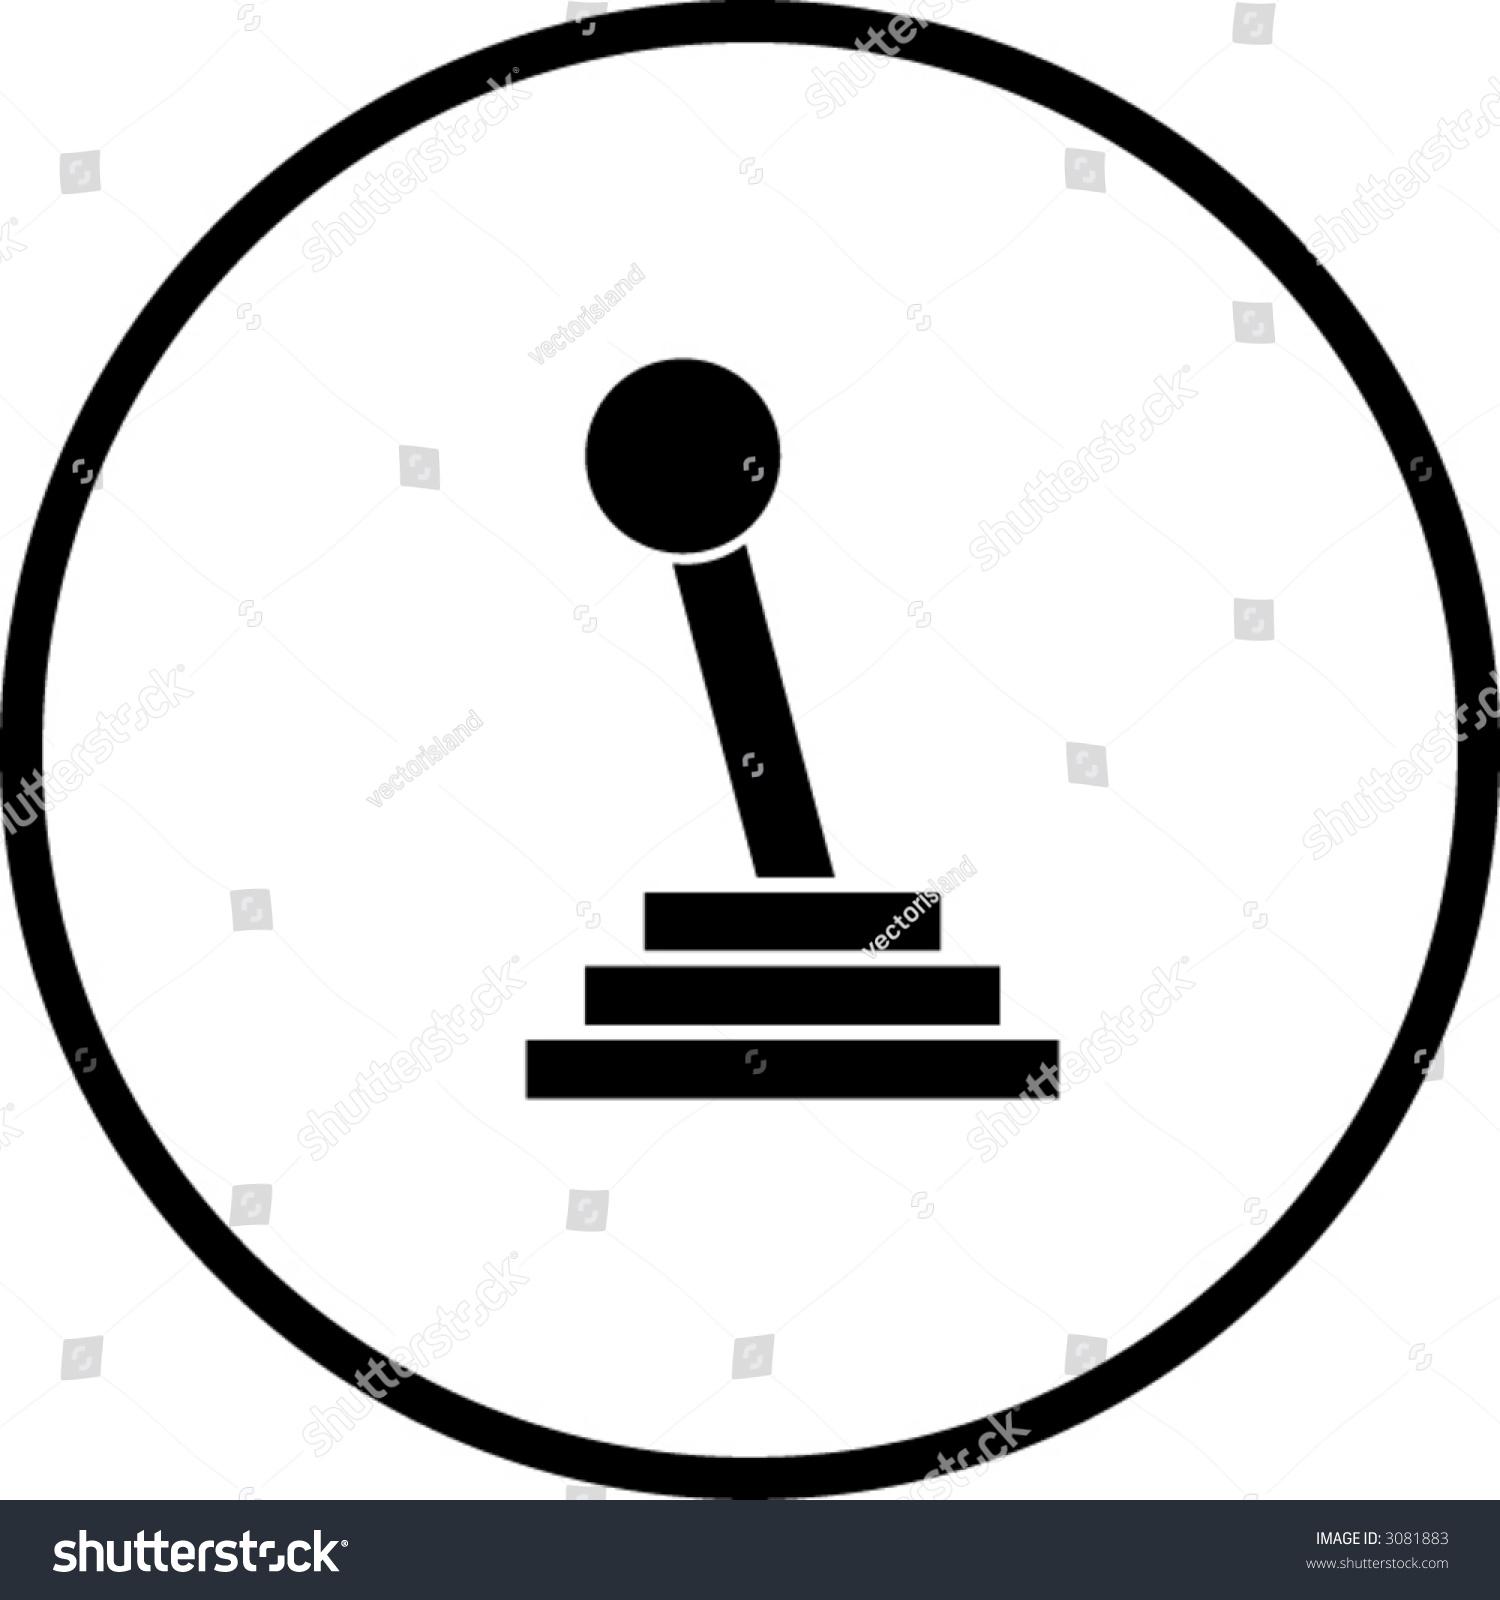 Astonishing Gear Shift Stick Symbol Stock Vektorgrafik Lizenzfrei 3081883 Wiring Cloud Hisonuggs Outletorg